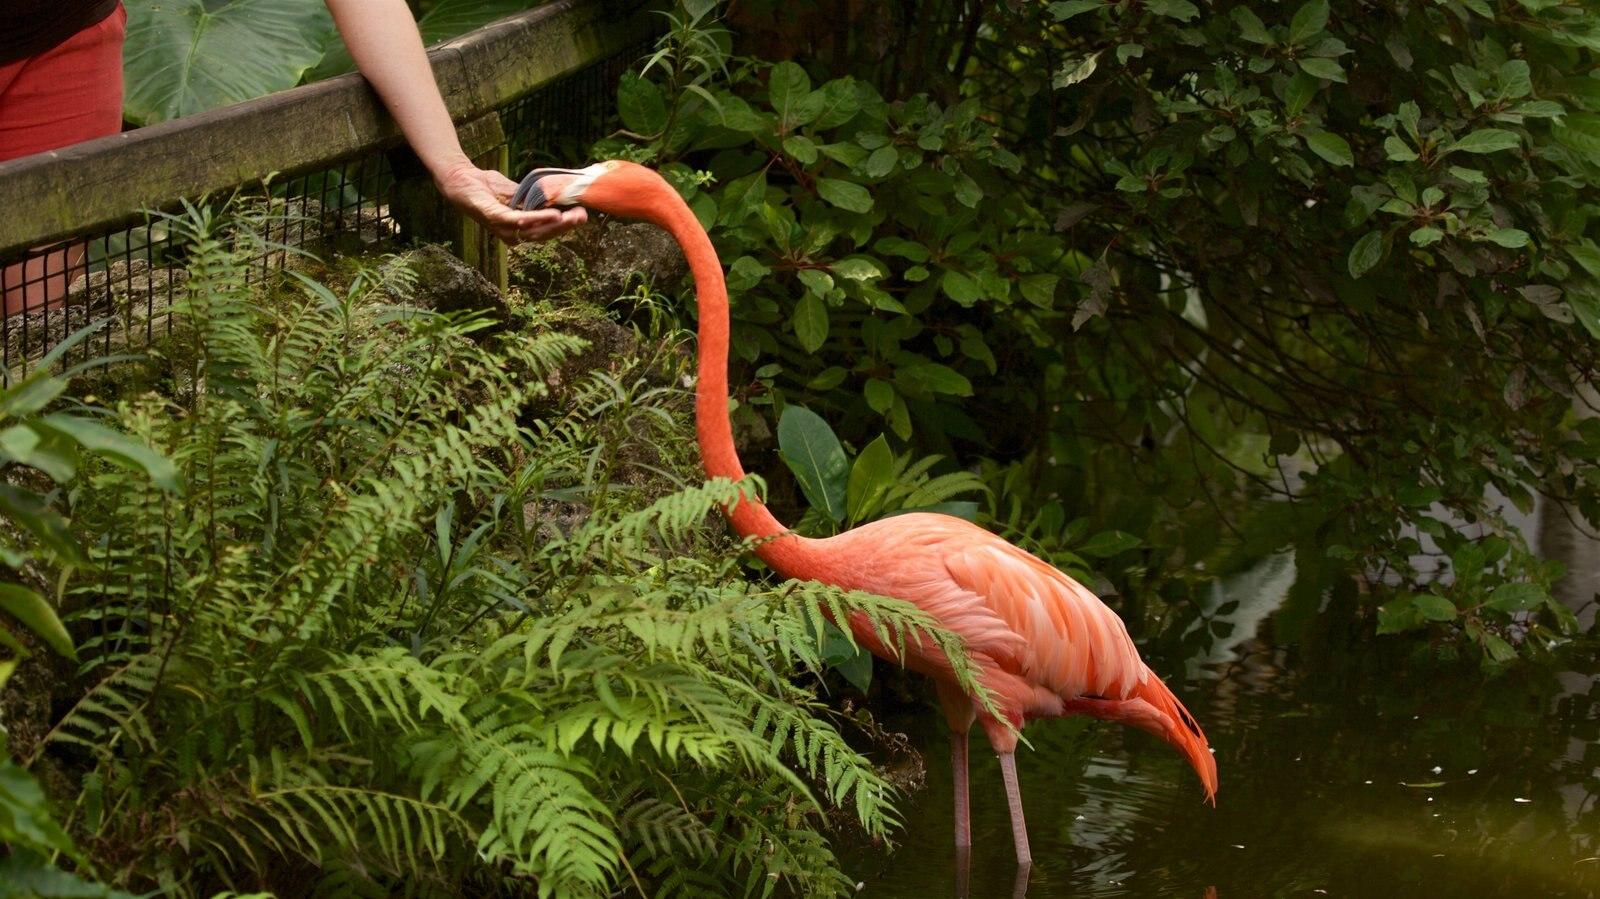 Flamingo Gardens featuring bird life and zoo animals